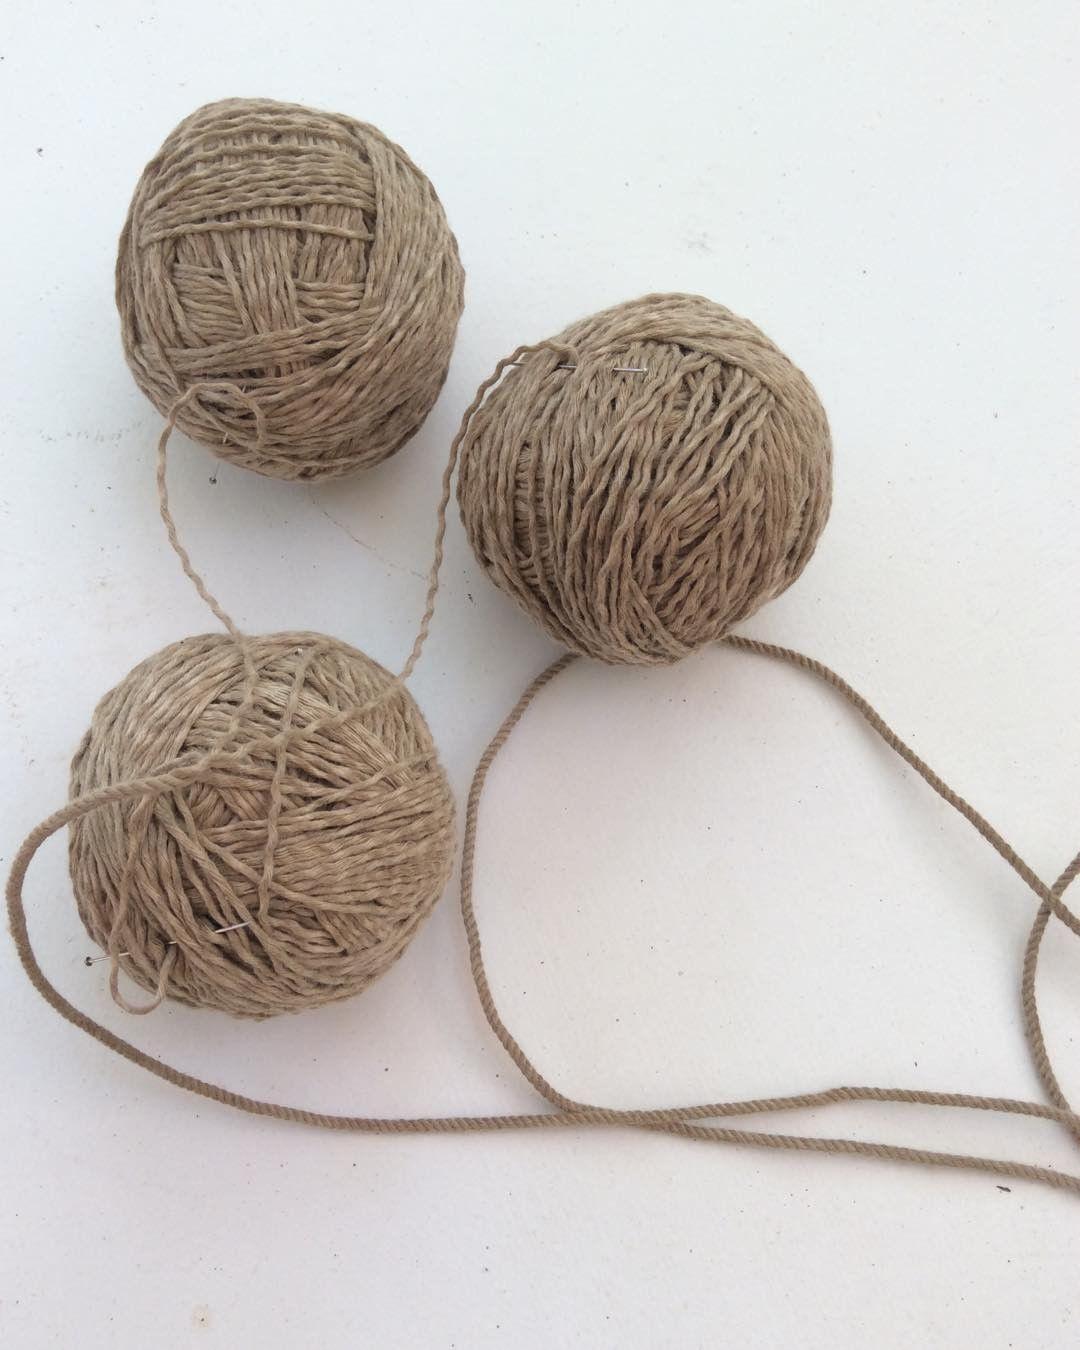 seabed-penelope-kouvara-fleves-project-tidal-flow--art-weaving-7